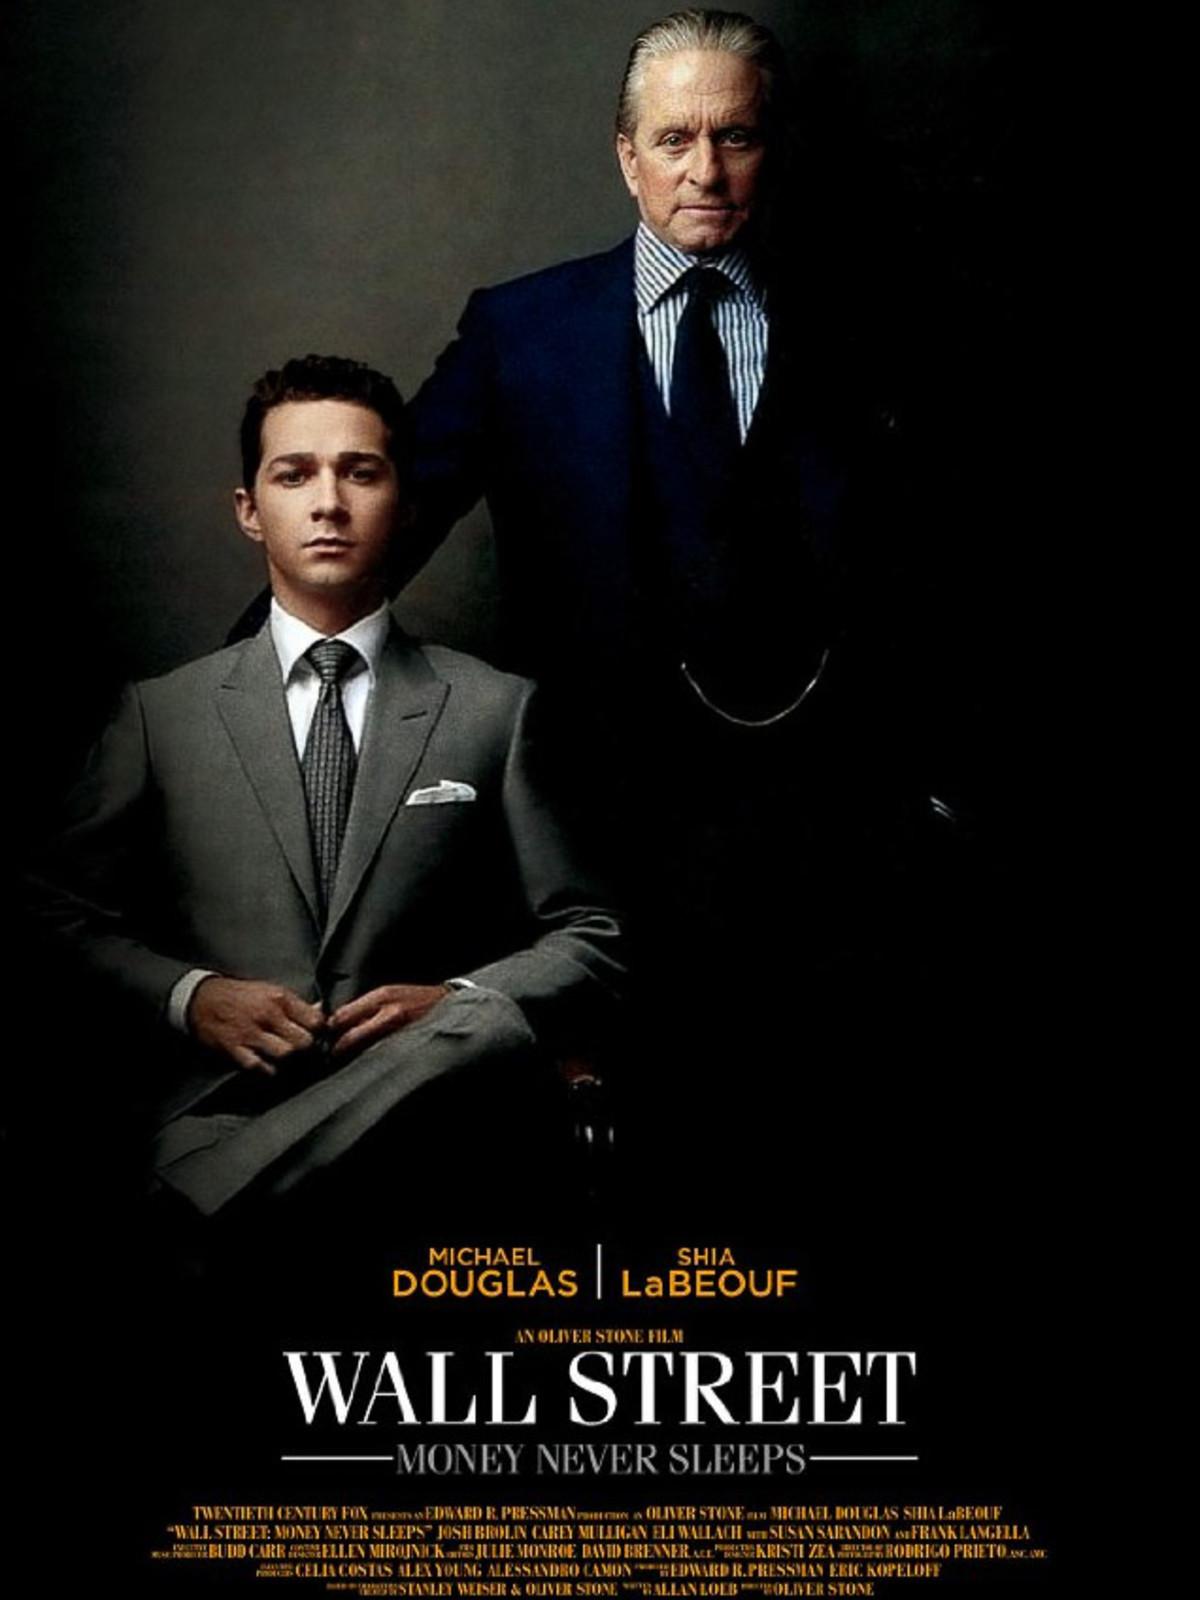 News_Wall Street_Money Never Sleeps_move_movie poster